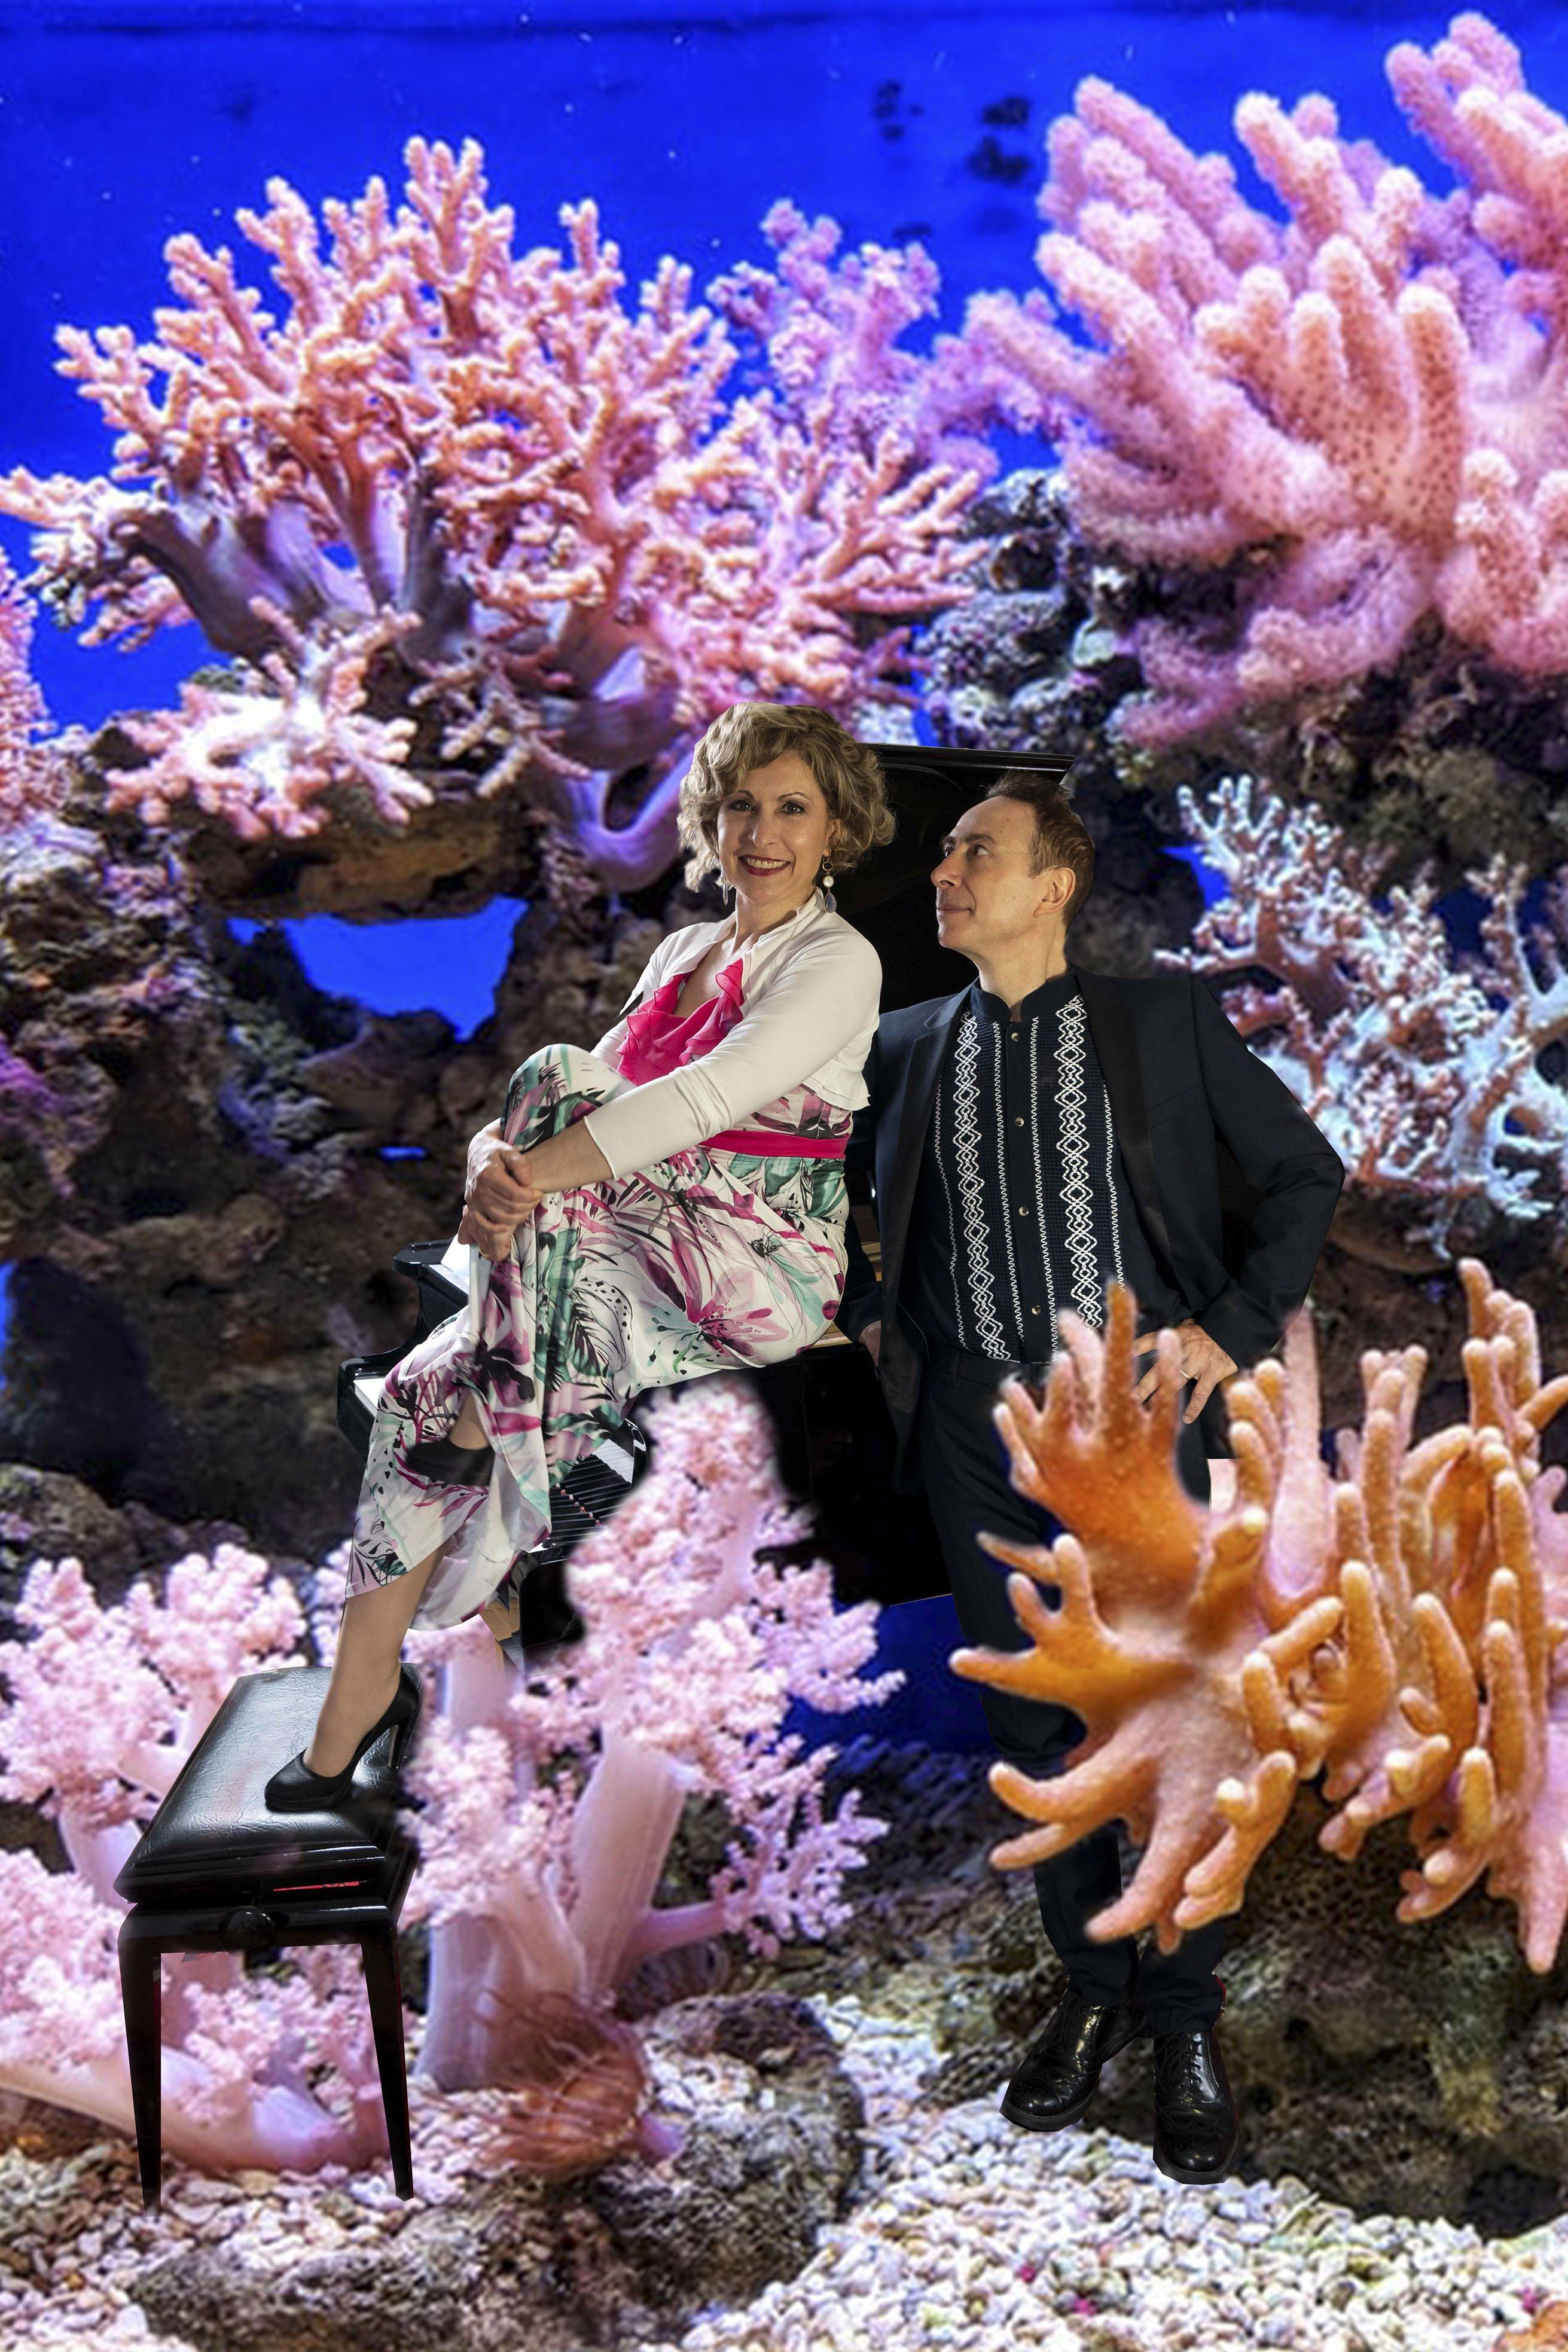 Duo Alterno tra i coralli _ mediumres